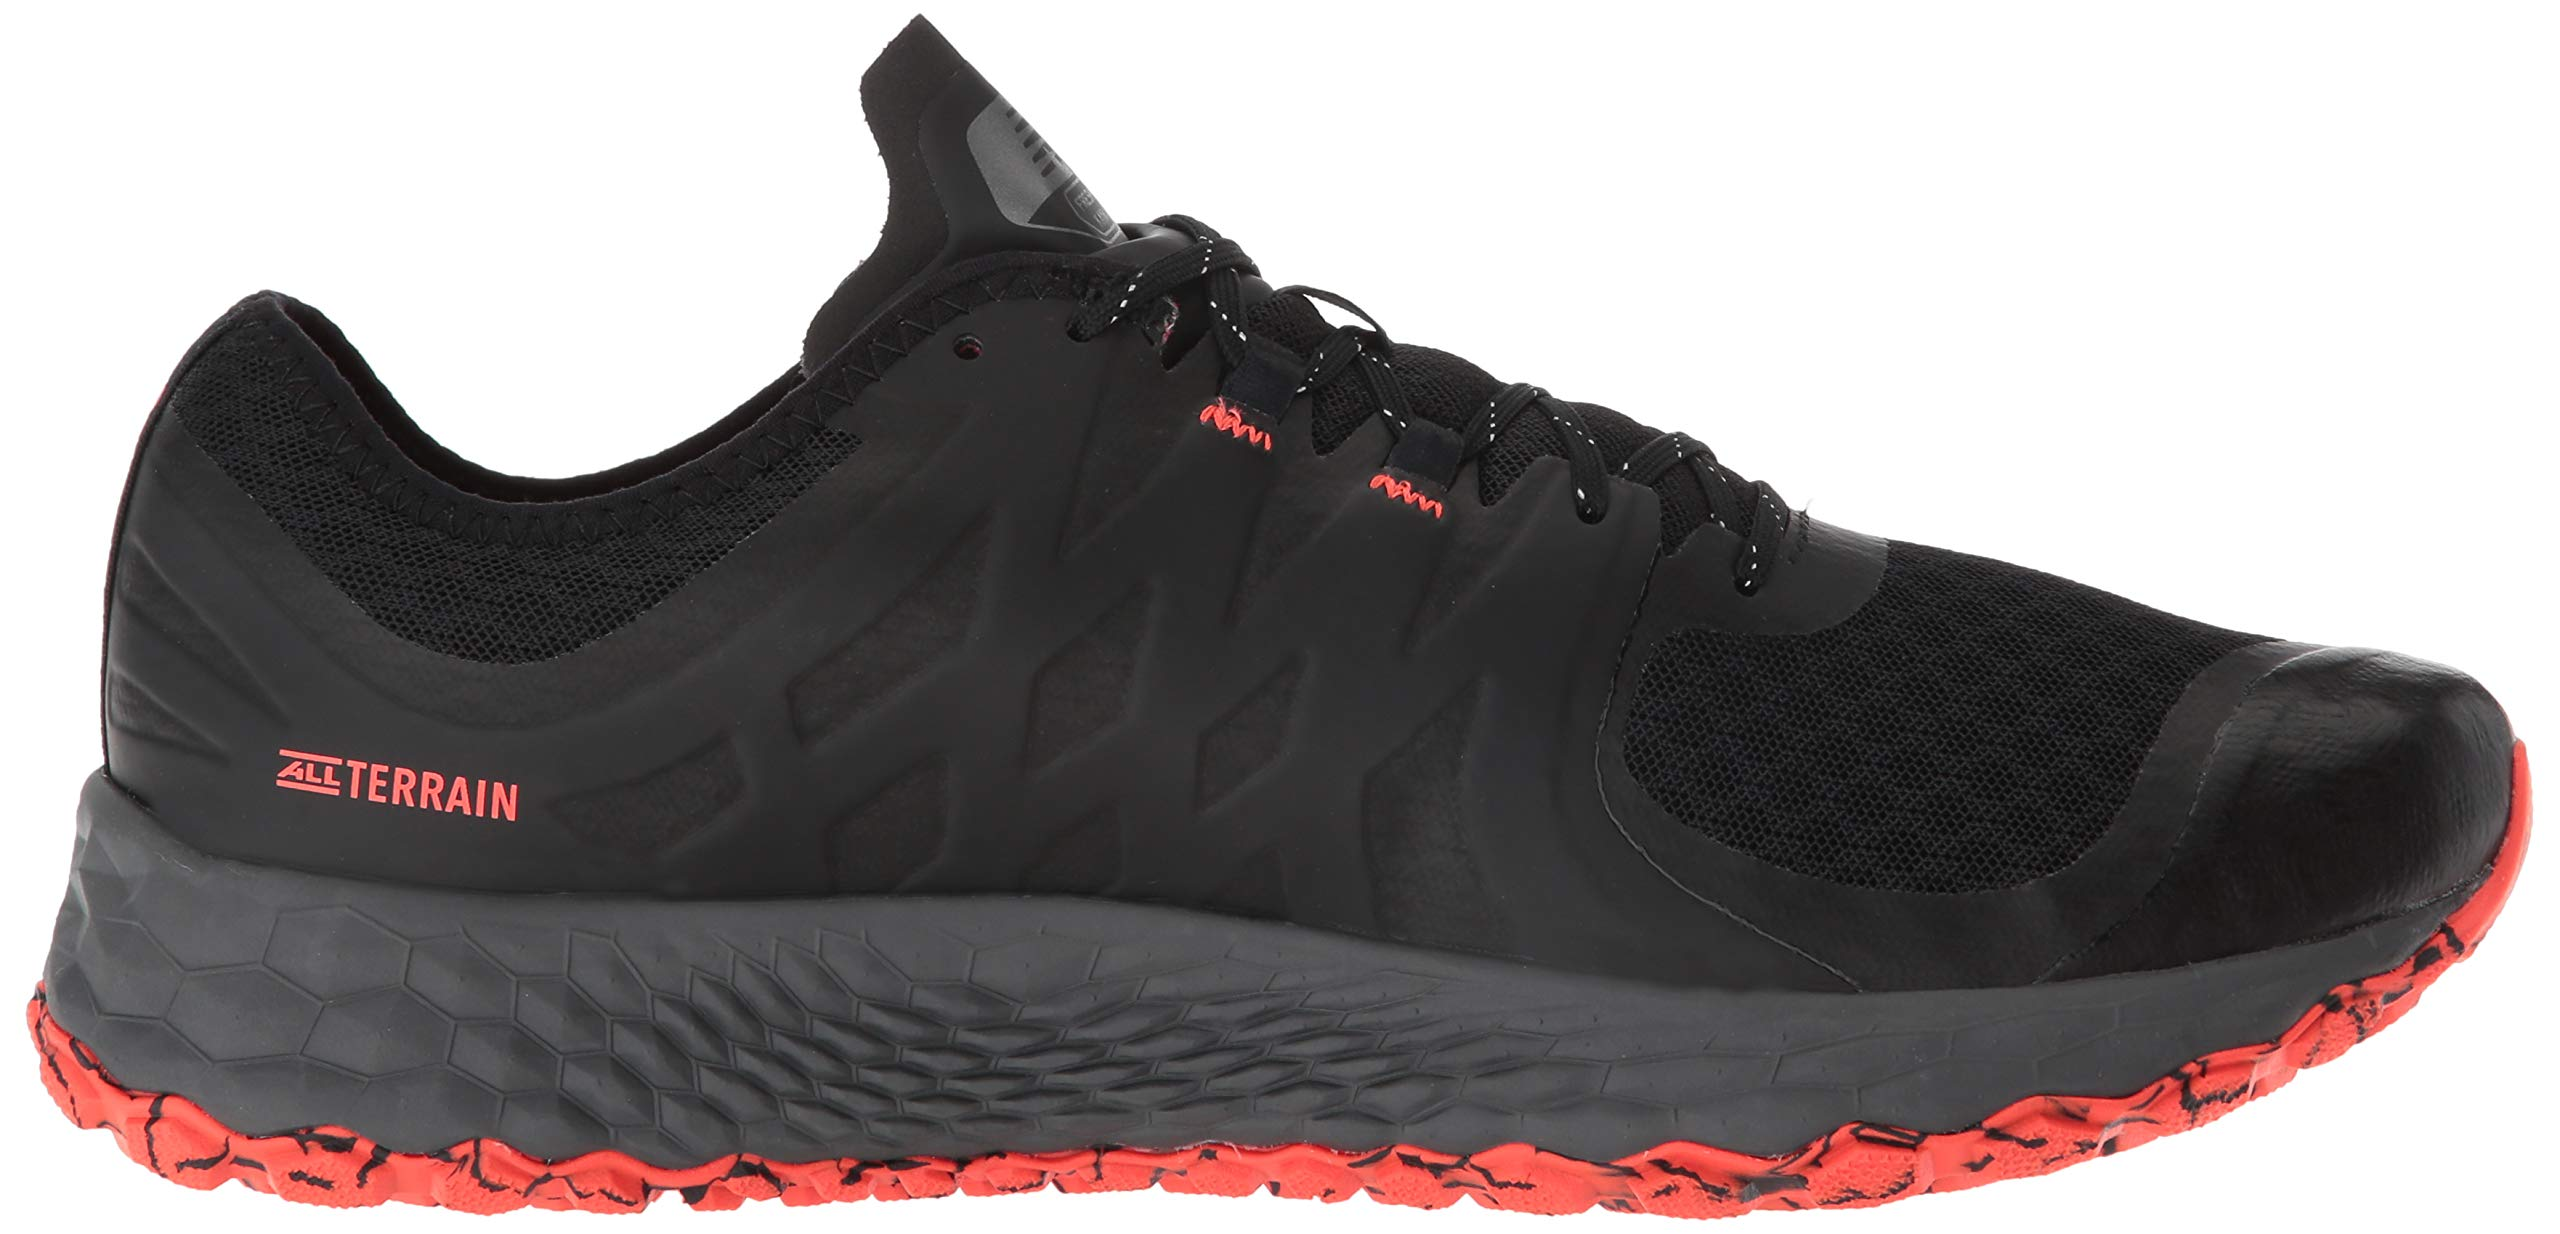 New Balance Men's Kaymin V1 Fresh Foam Trail Running Shoe, Black/Flame/Reflective, 1.5 D US by New Balance (Image #7)